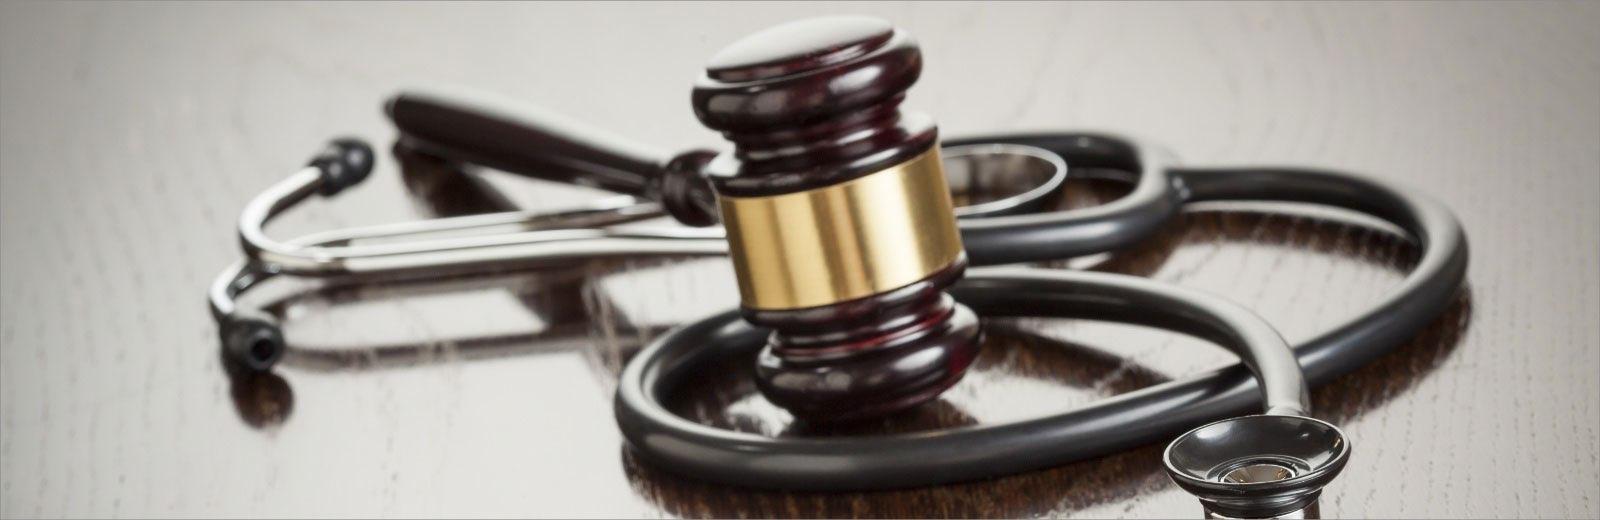 MDR enhances patient safety